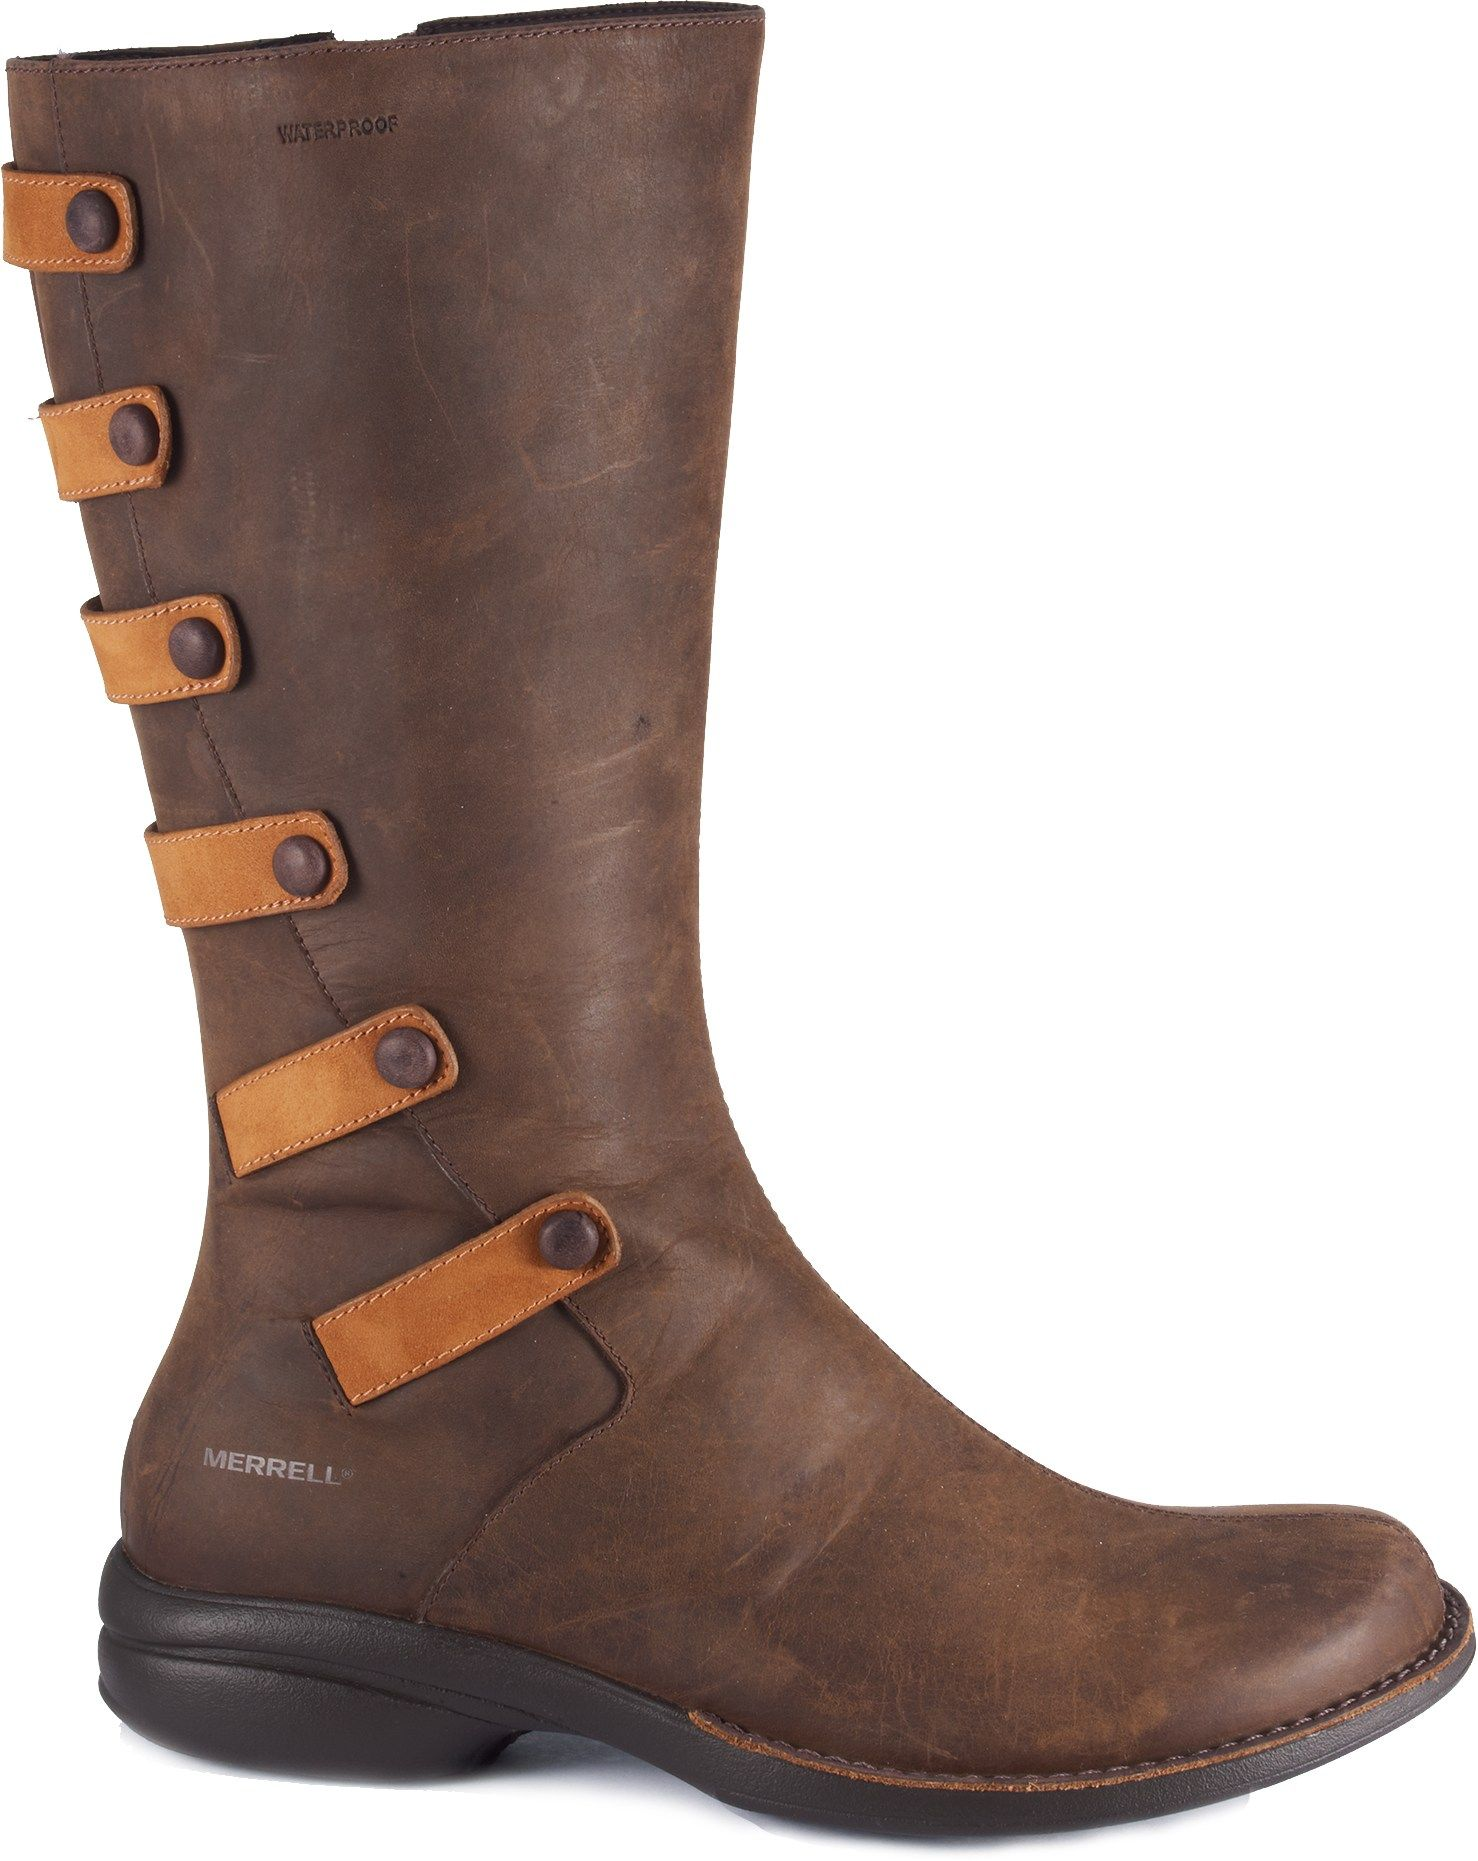 8b97848c99121 Merrell Captiva Launch Waterproof Boots | Fashion | Pinterest